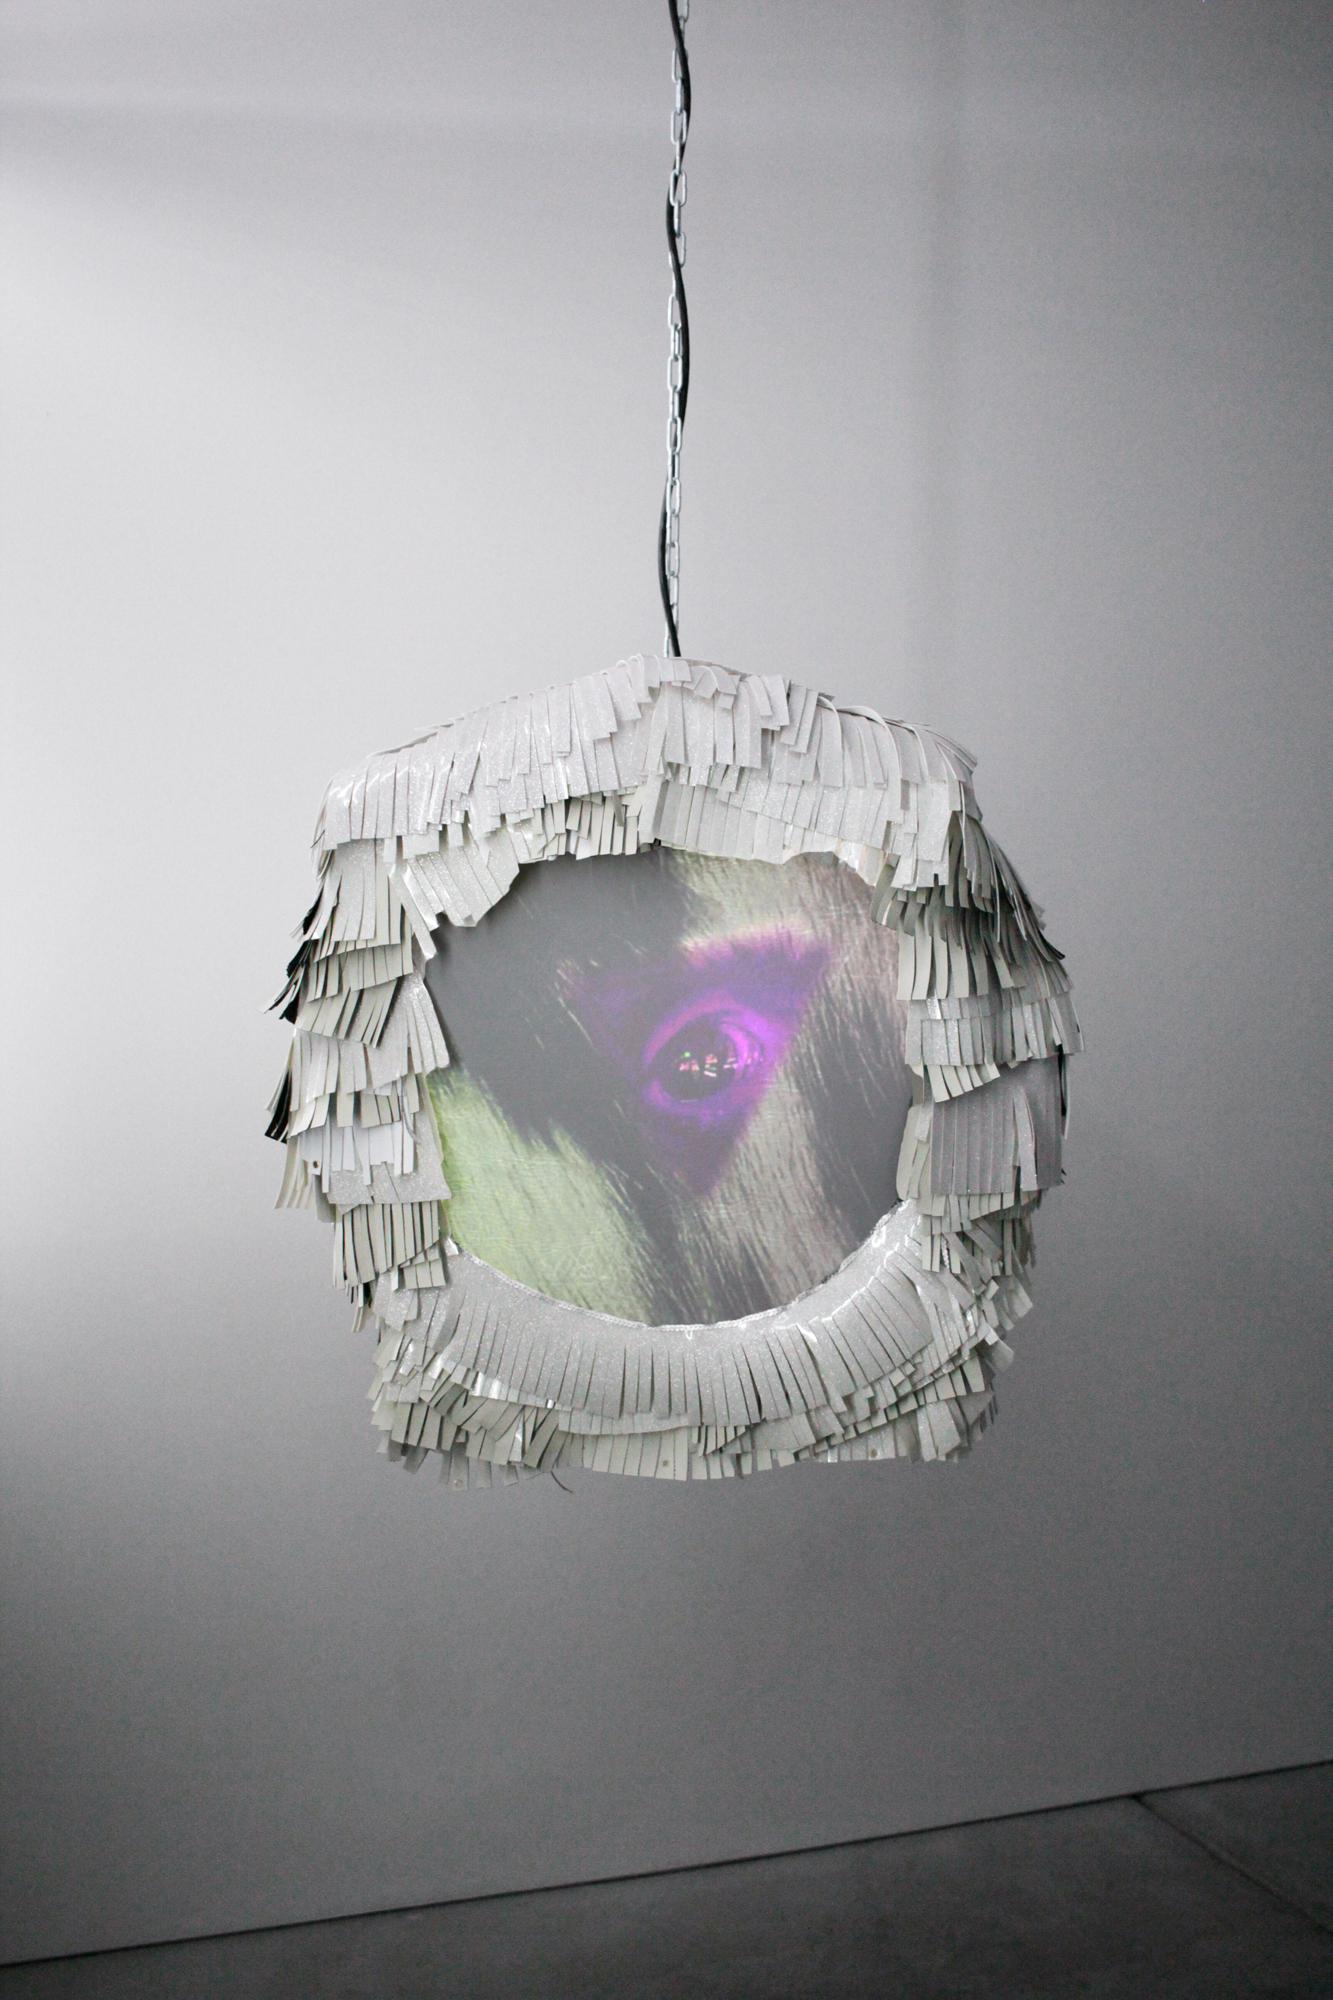 Kate Rhoades, Calfskin, installation view